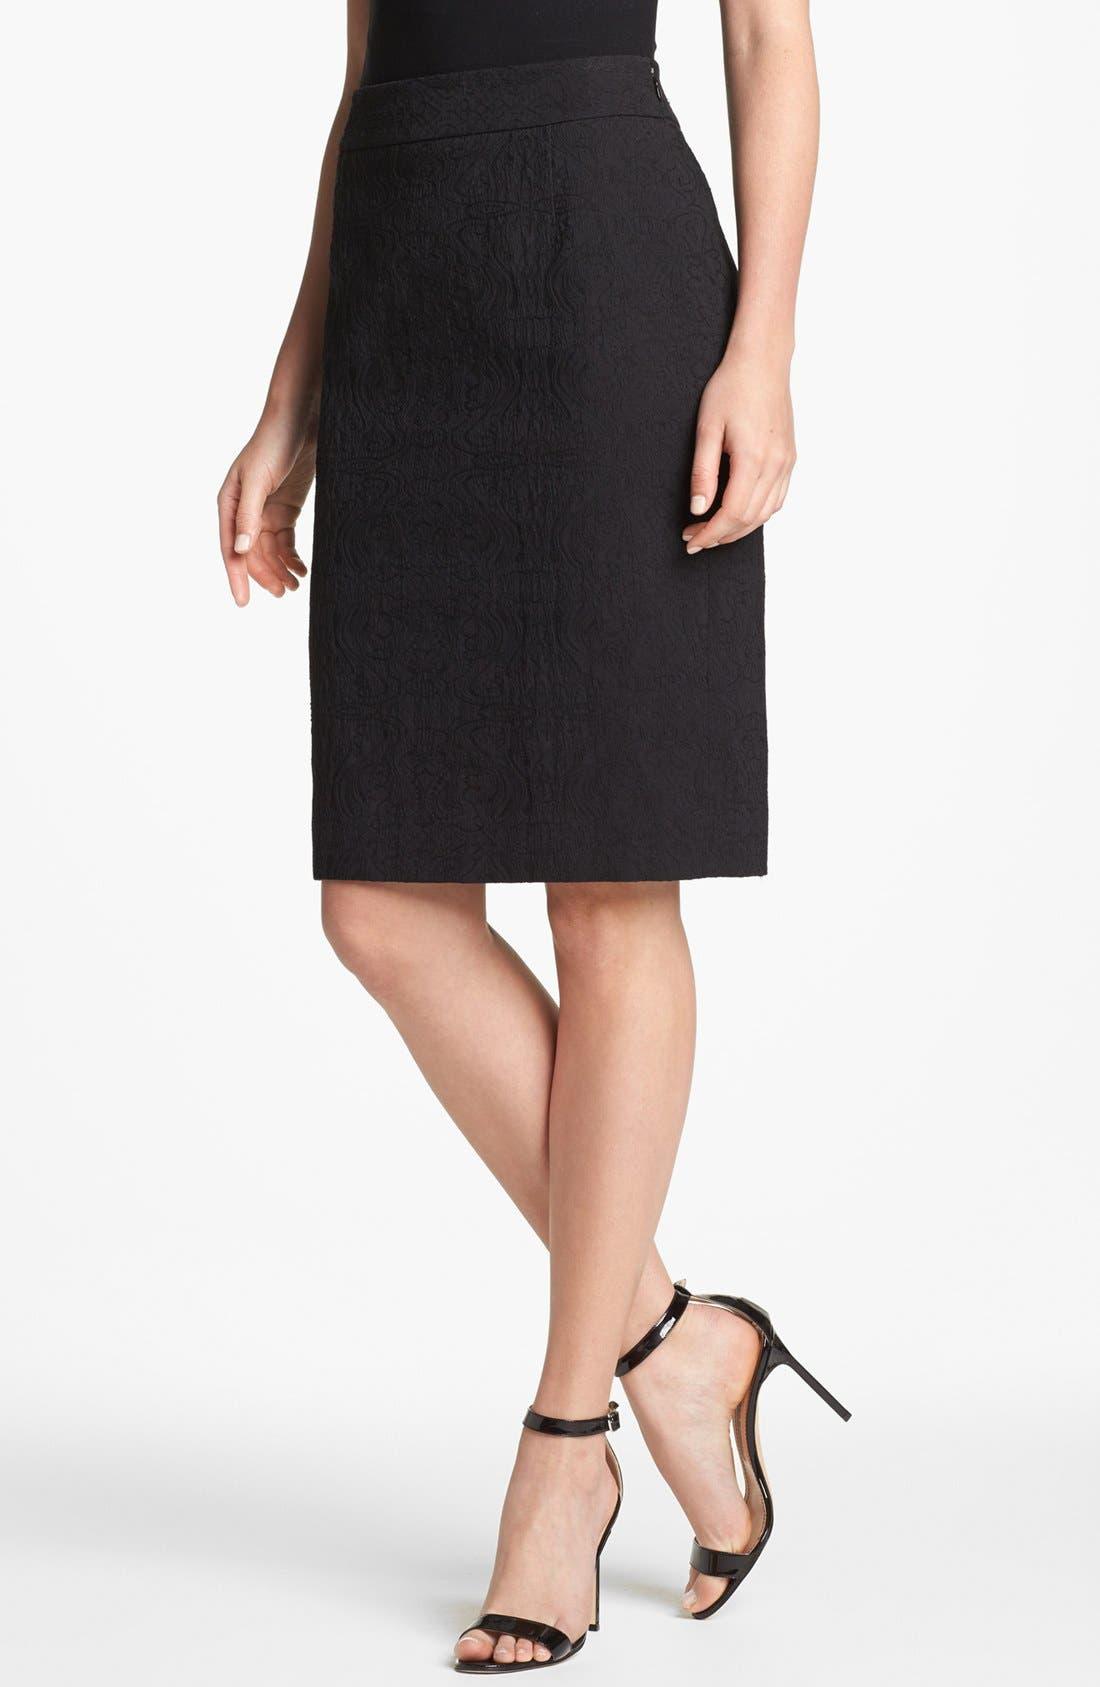 Alternate Image 1 Selected - Classiques Entier® 'Bursa Jacquard' Skirt